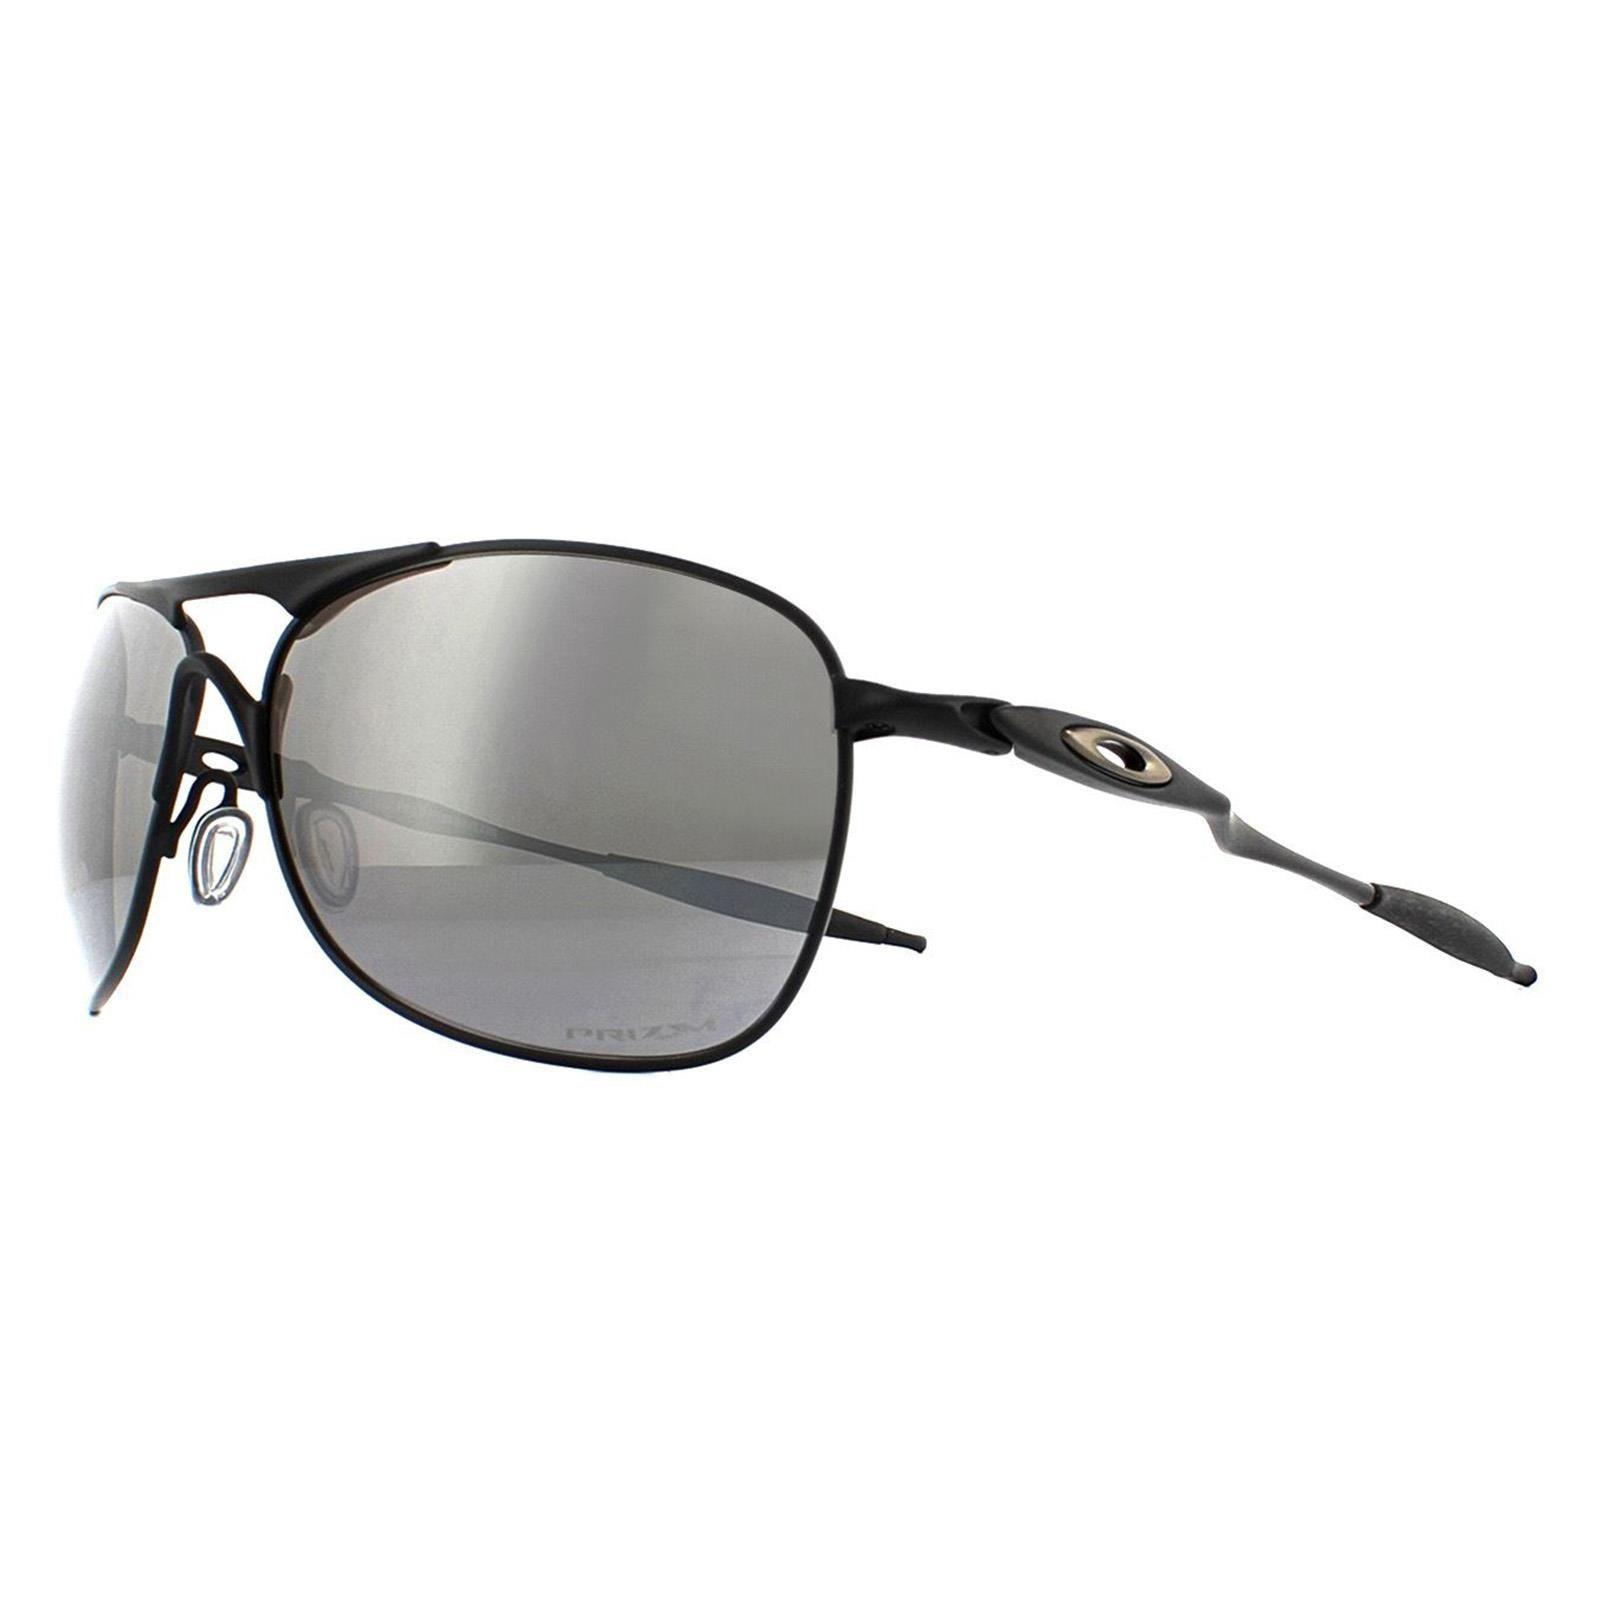 Oakley Sunglasses Crosshair OO4060-23 Matte Black Prizm Black